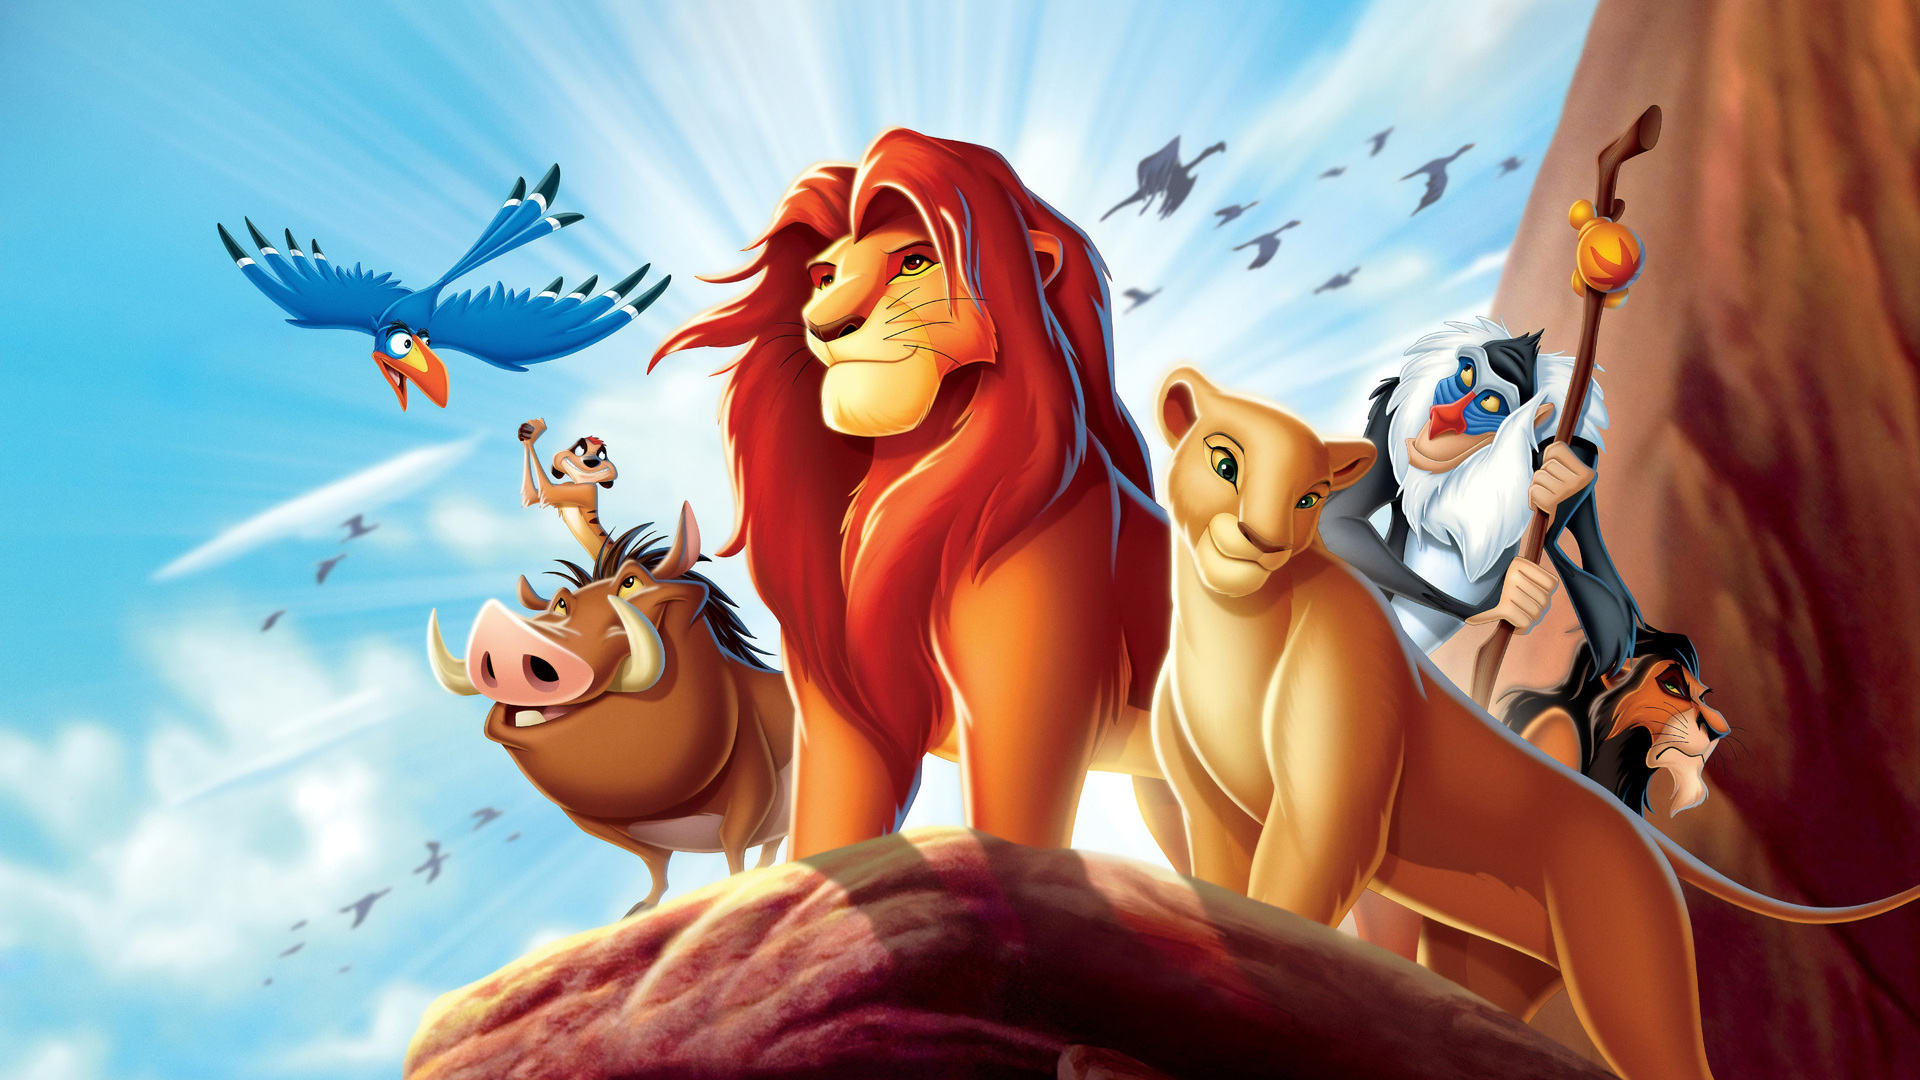 1920x1080 Lion King 1994 Laptop Full Hd 1080p Hd 4k Wallpapers